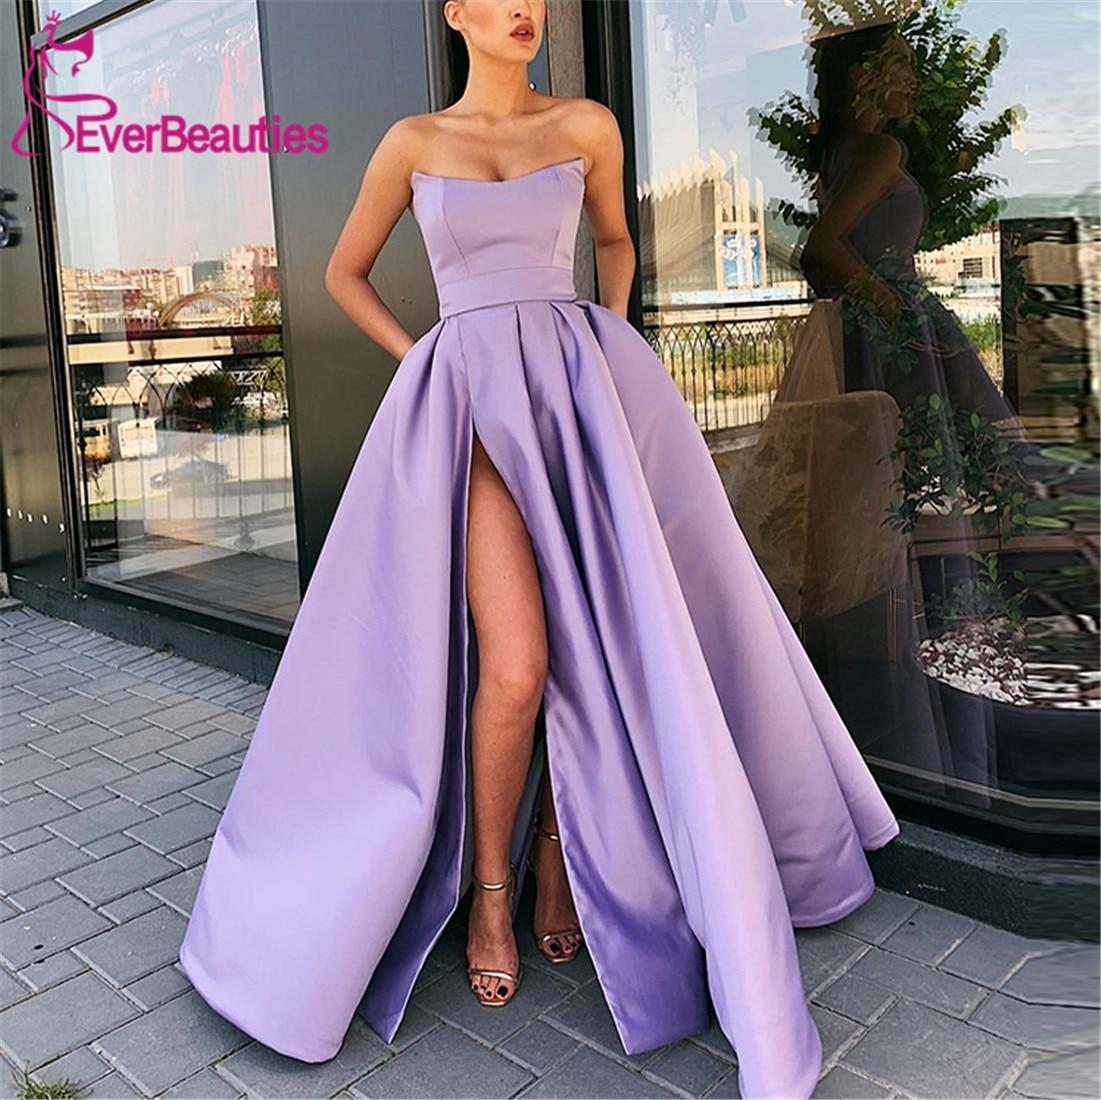 Prom Dresses 2019 with High Slit Satin Purple Vestidos De Gala Evening Party Dresses Prom Gown Robe De Soiree